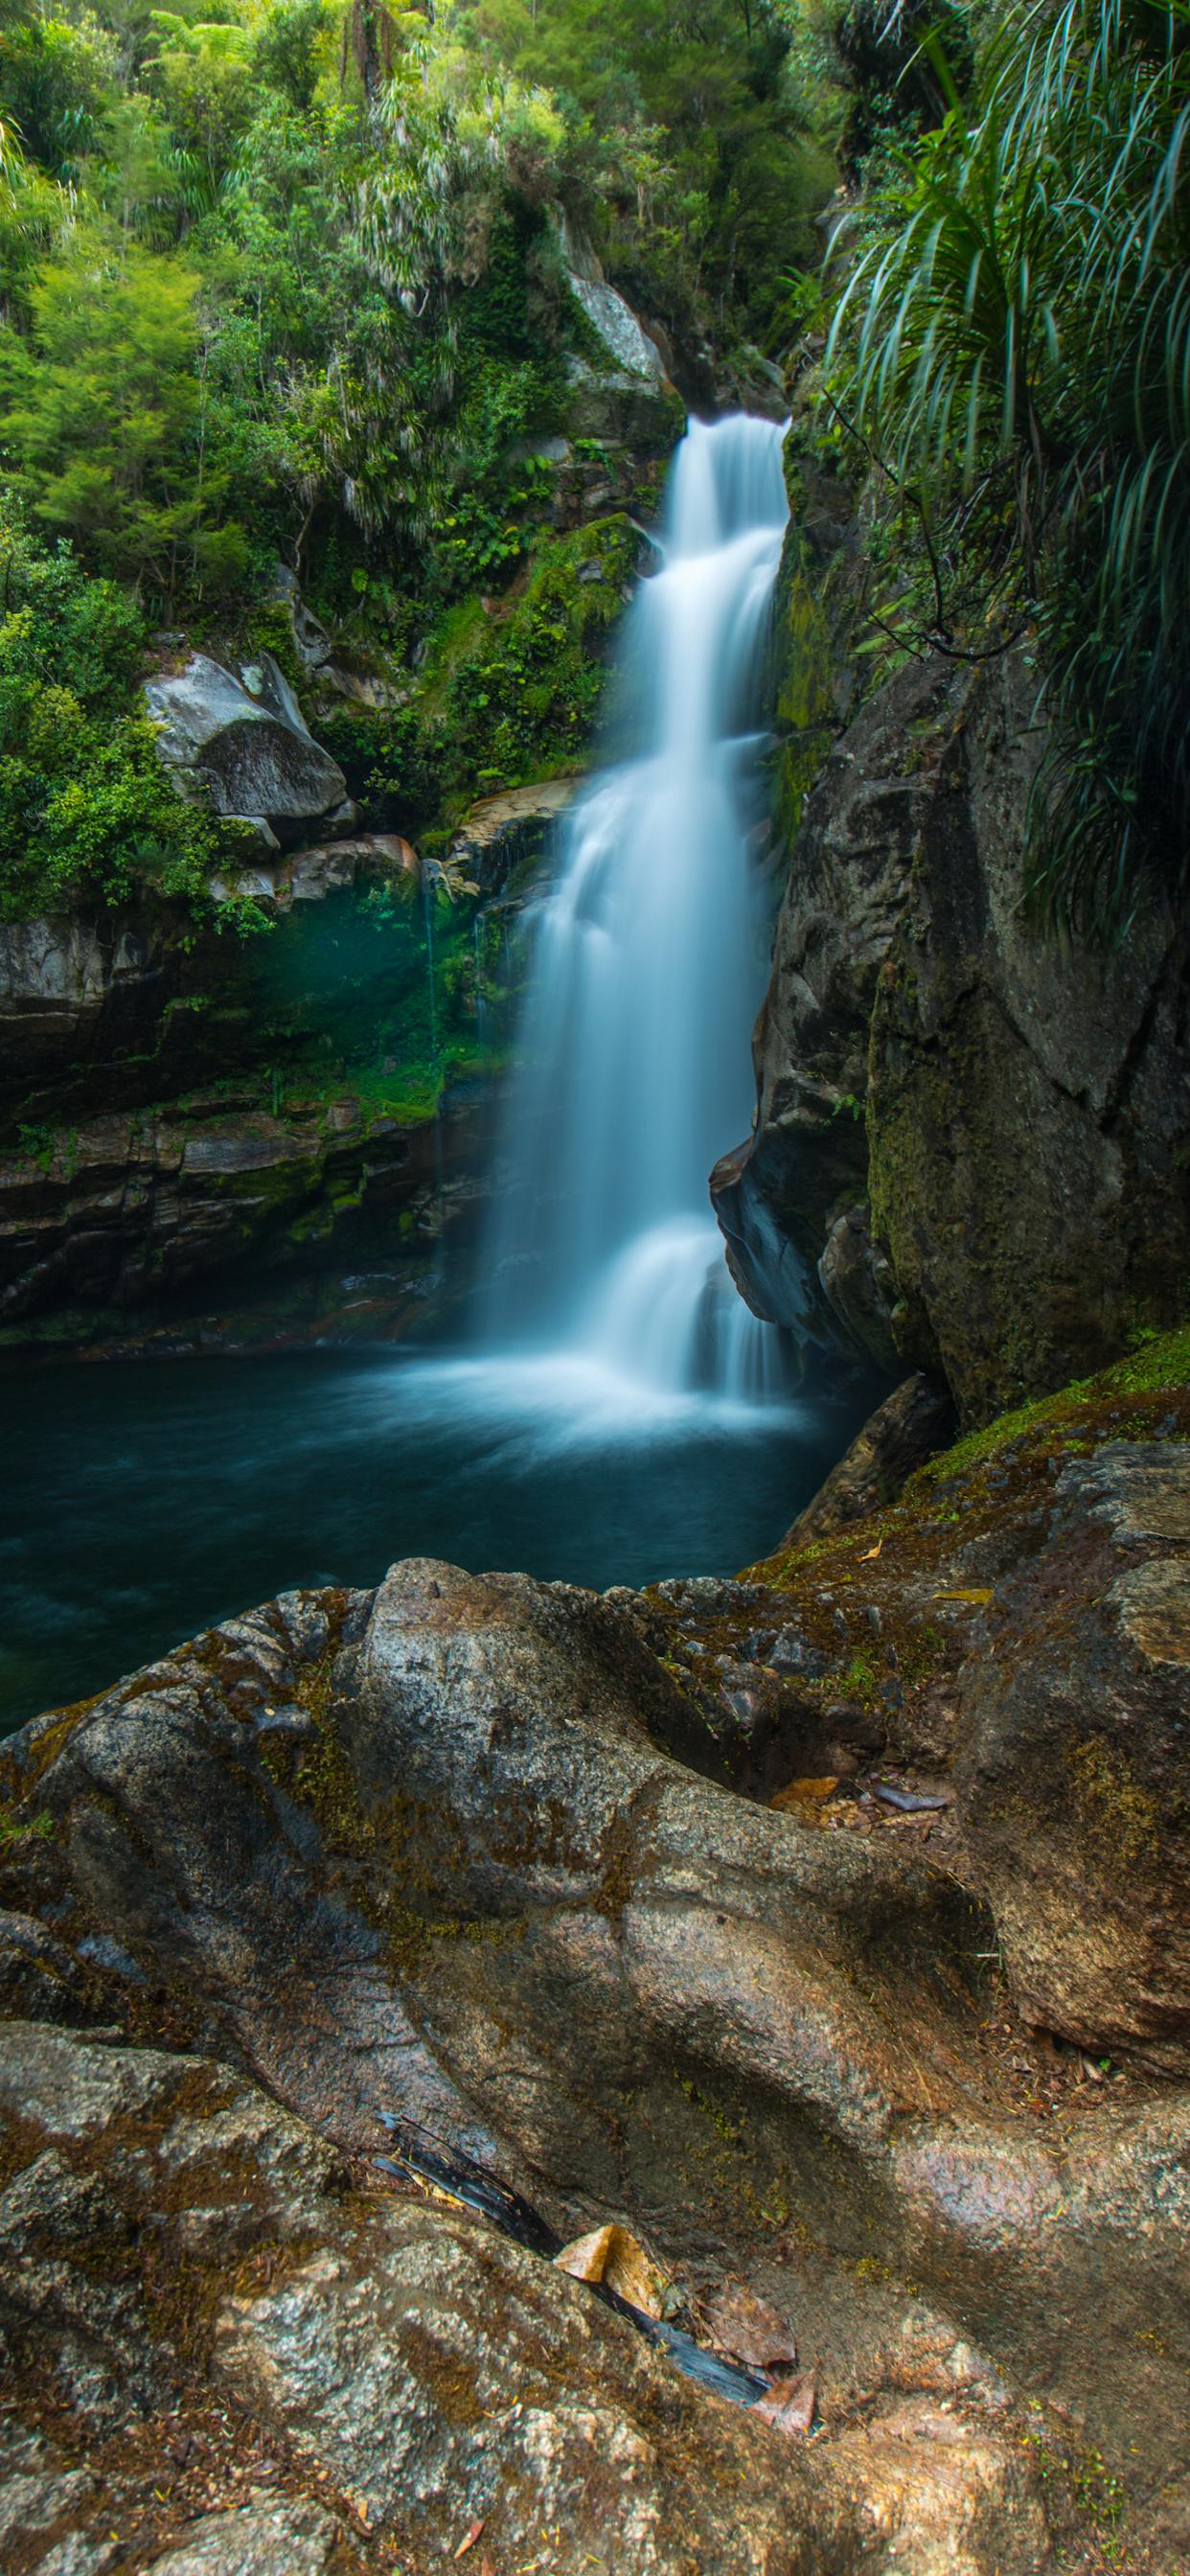 iPhone wallpapers waterfall wainui falls Fonds d'écran iPhone du 15/11/2019